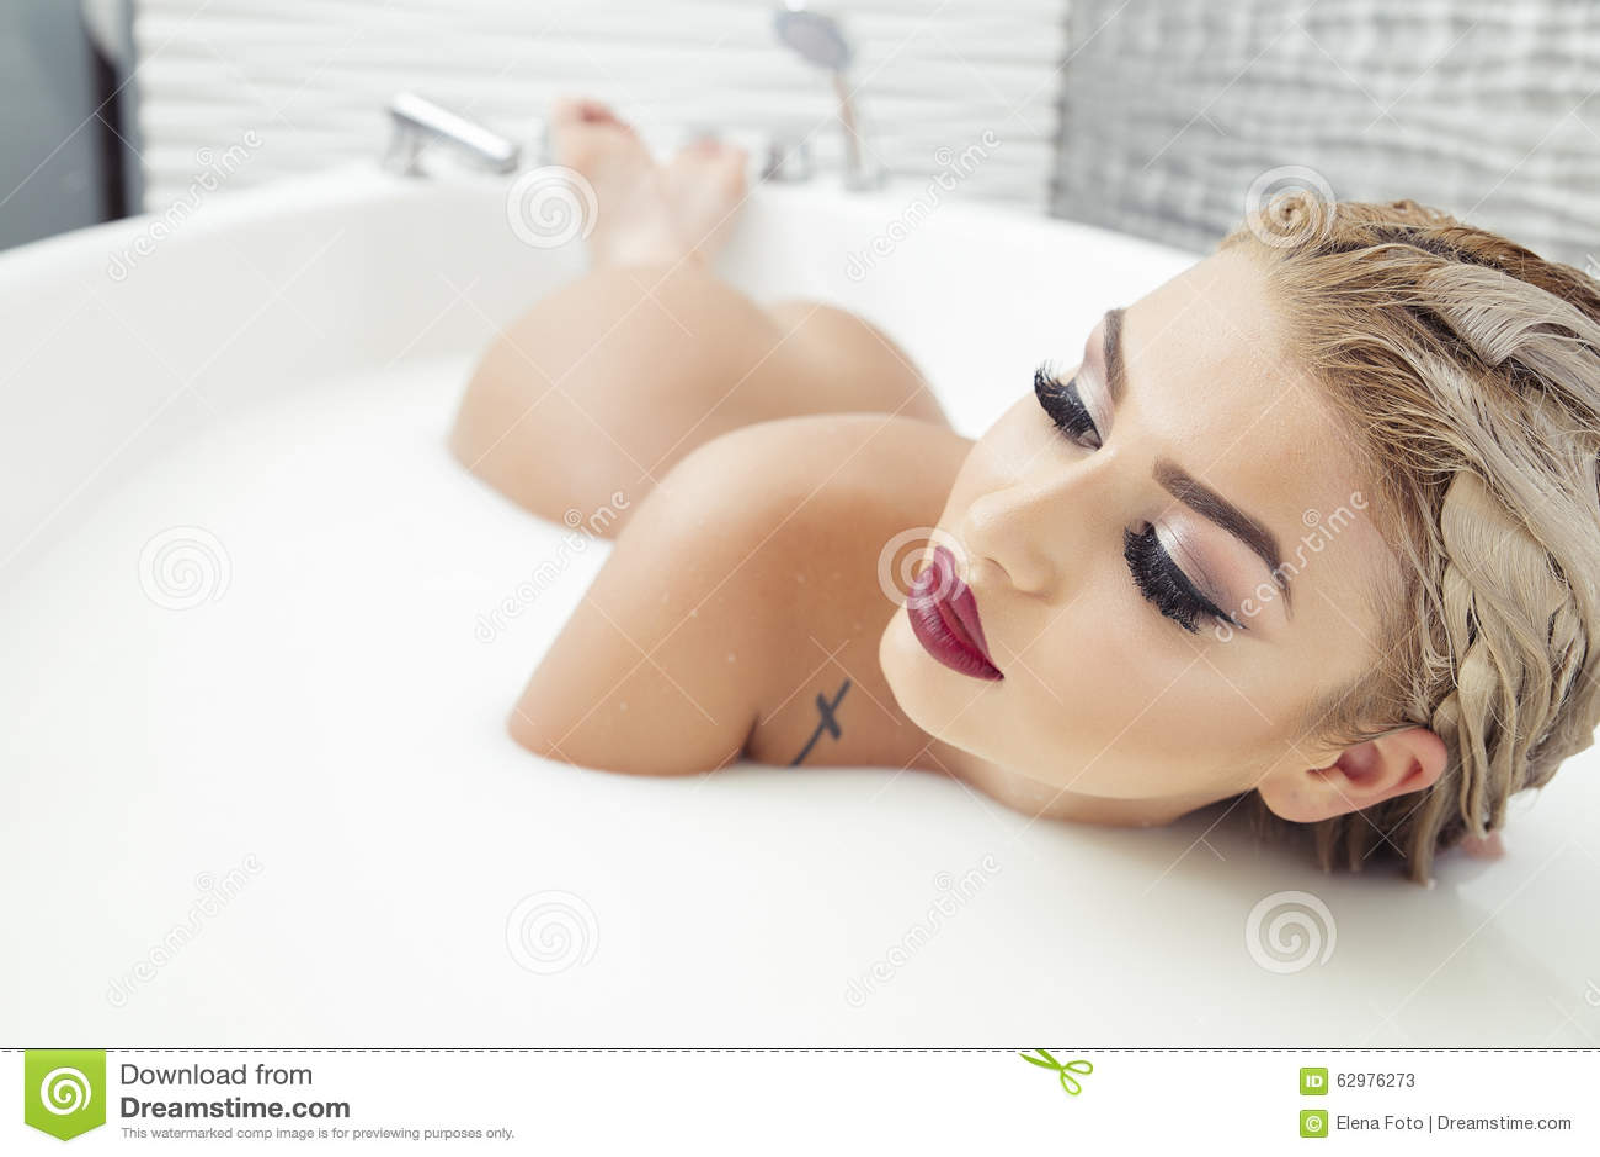 Badewanne Sexy